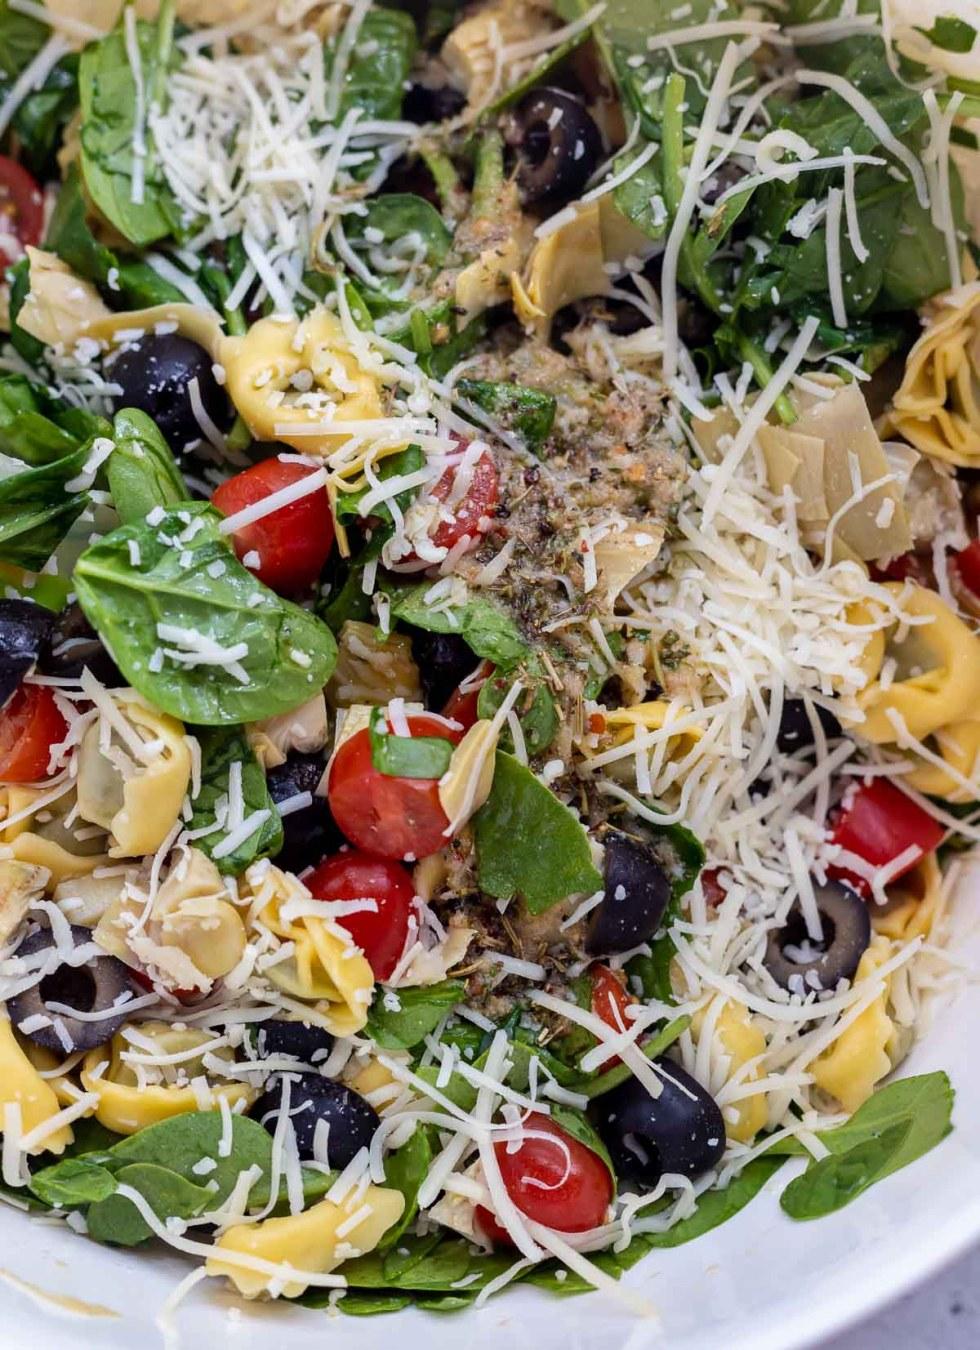 Italian pasta salad ingredients in white bowl